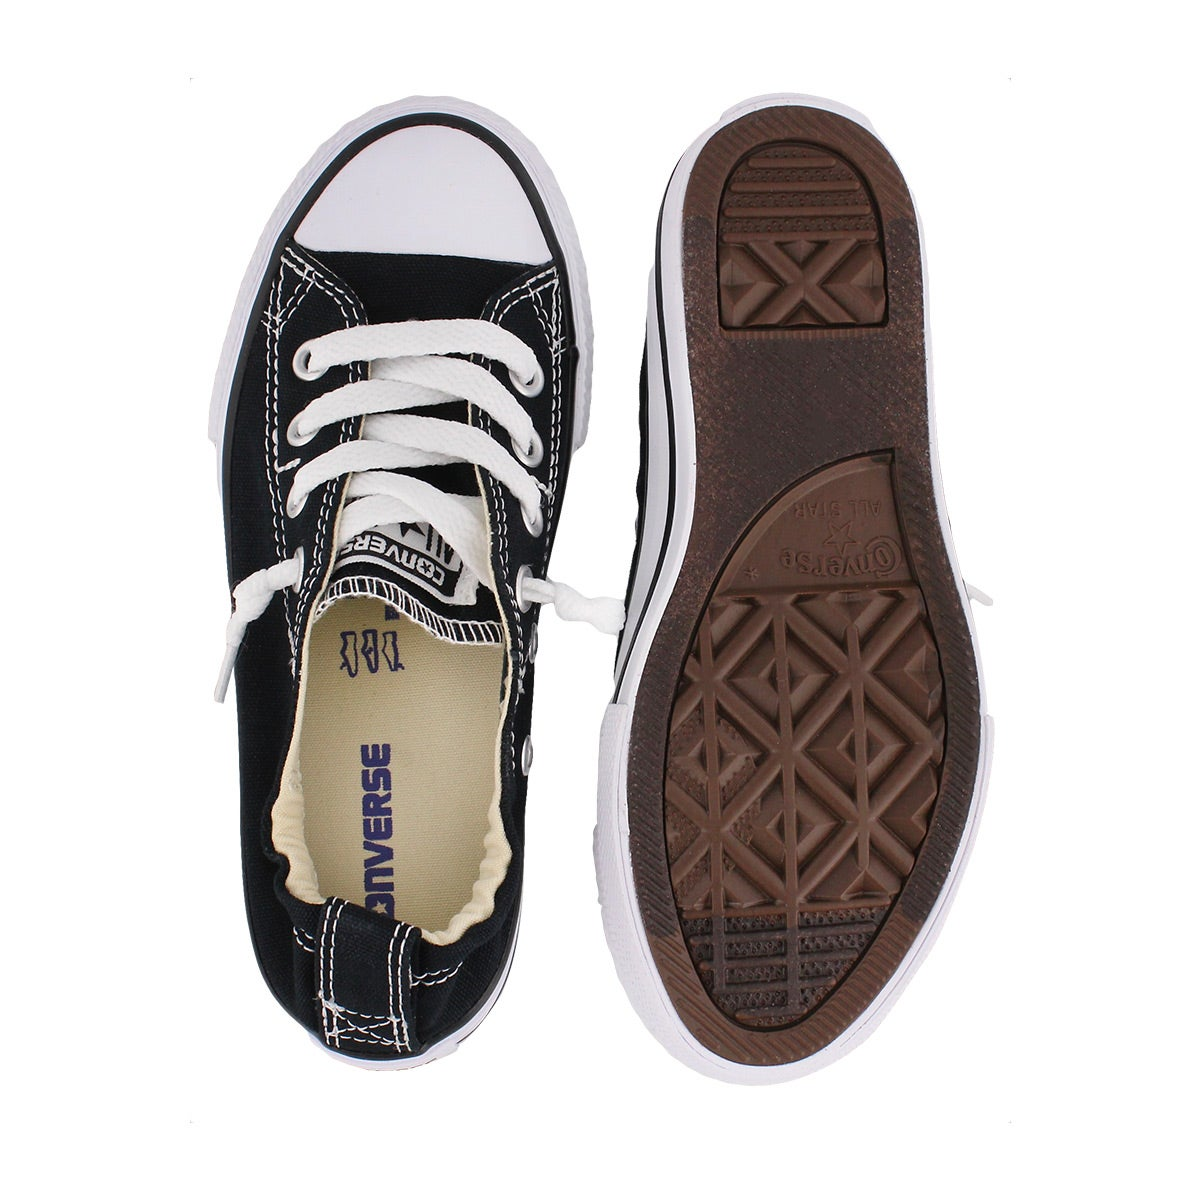 Grls Shoreline black sneaker